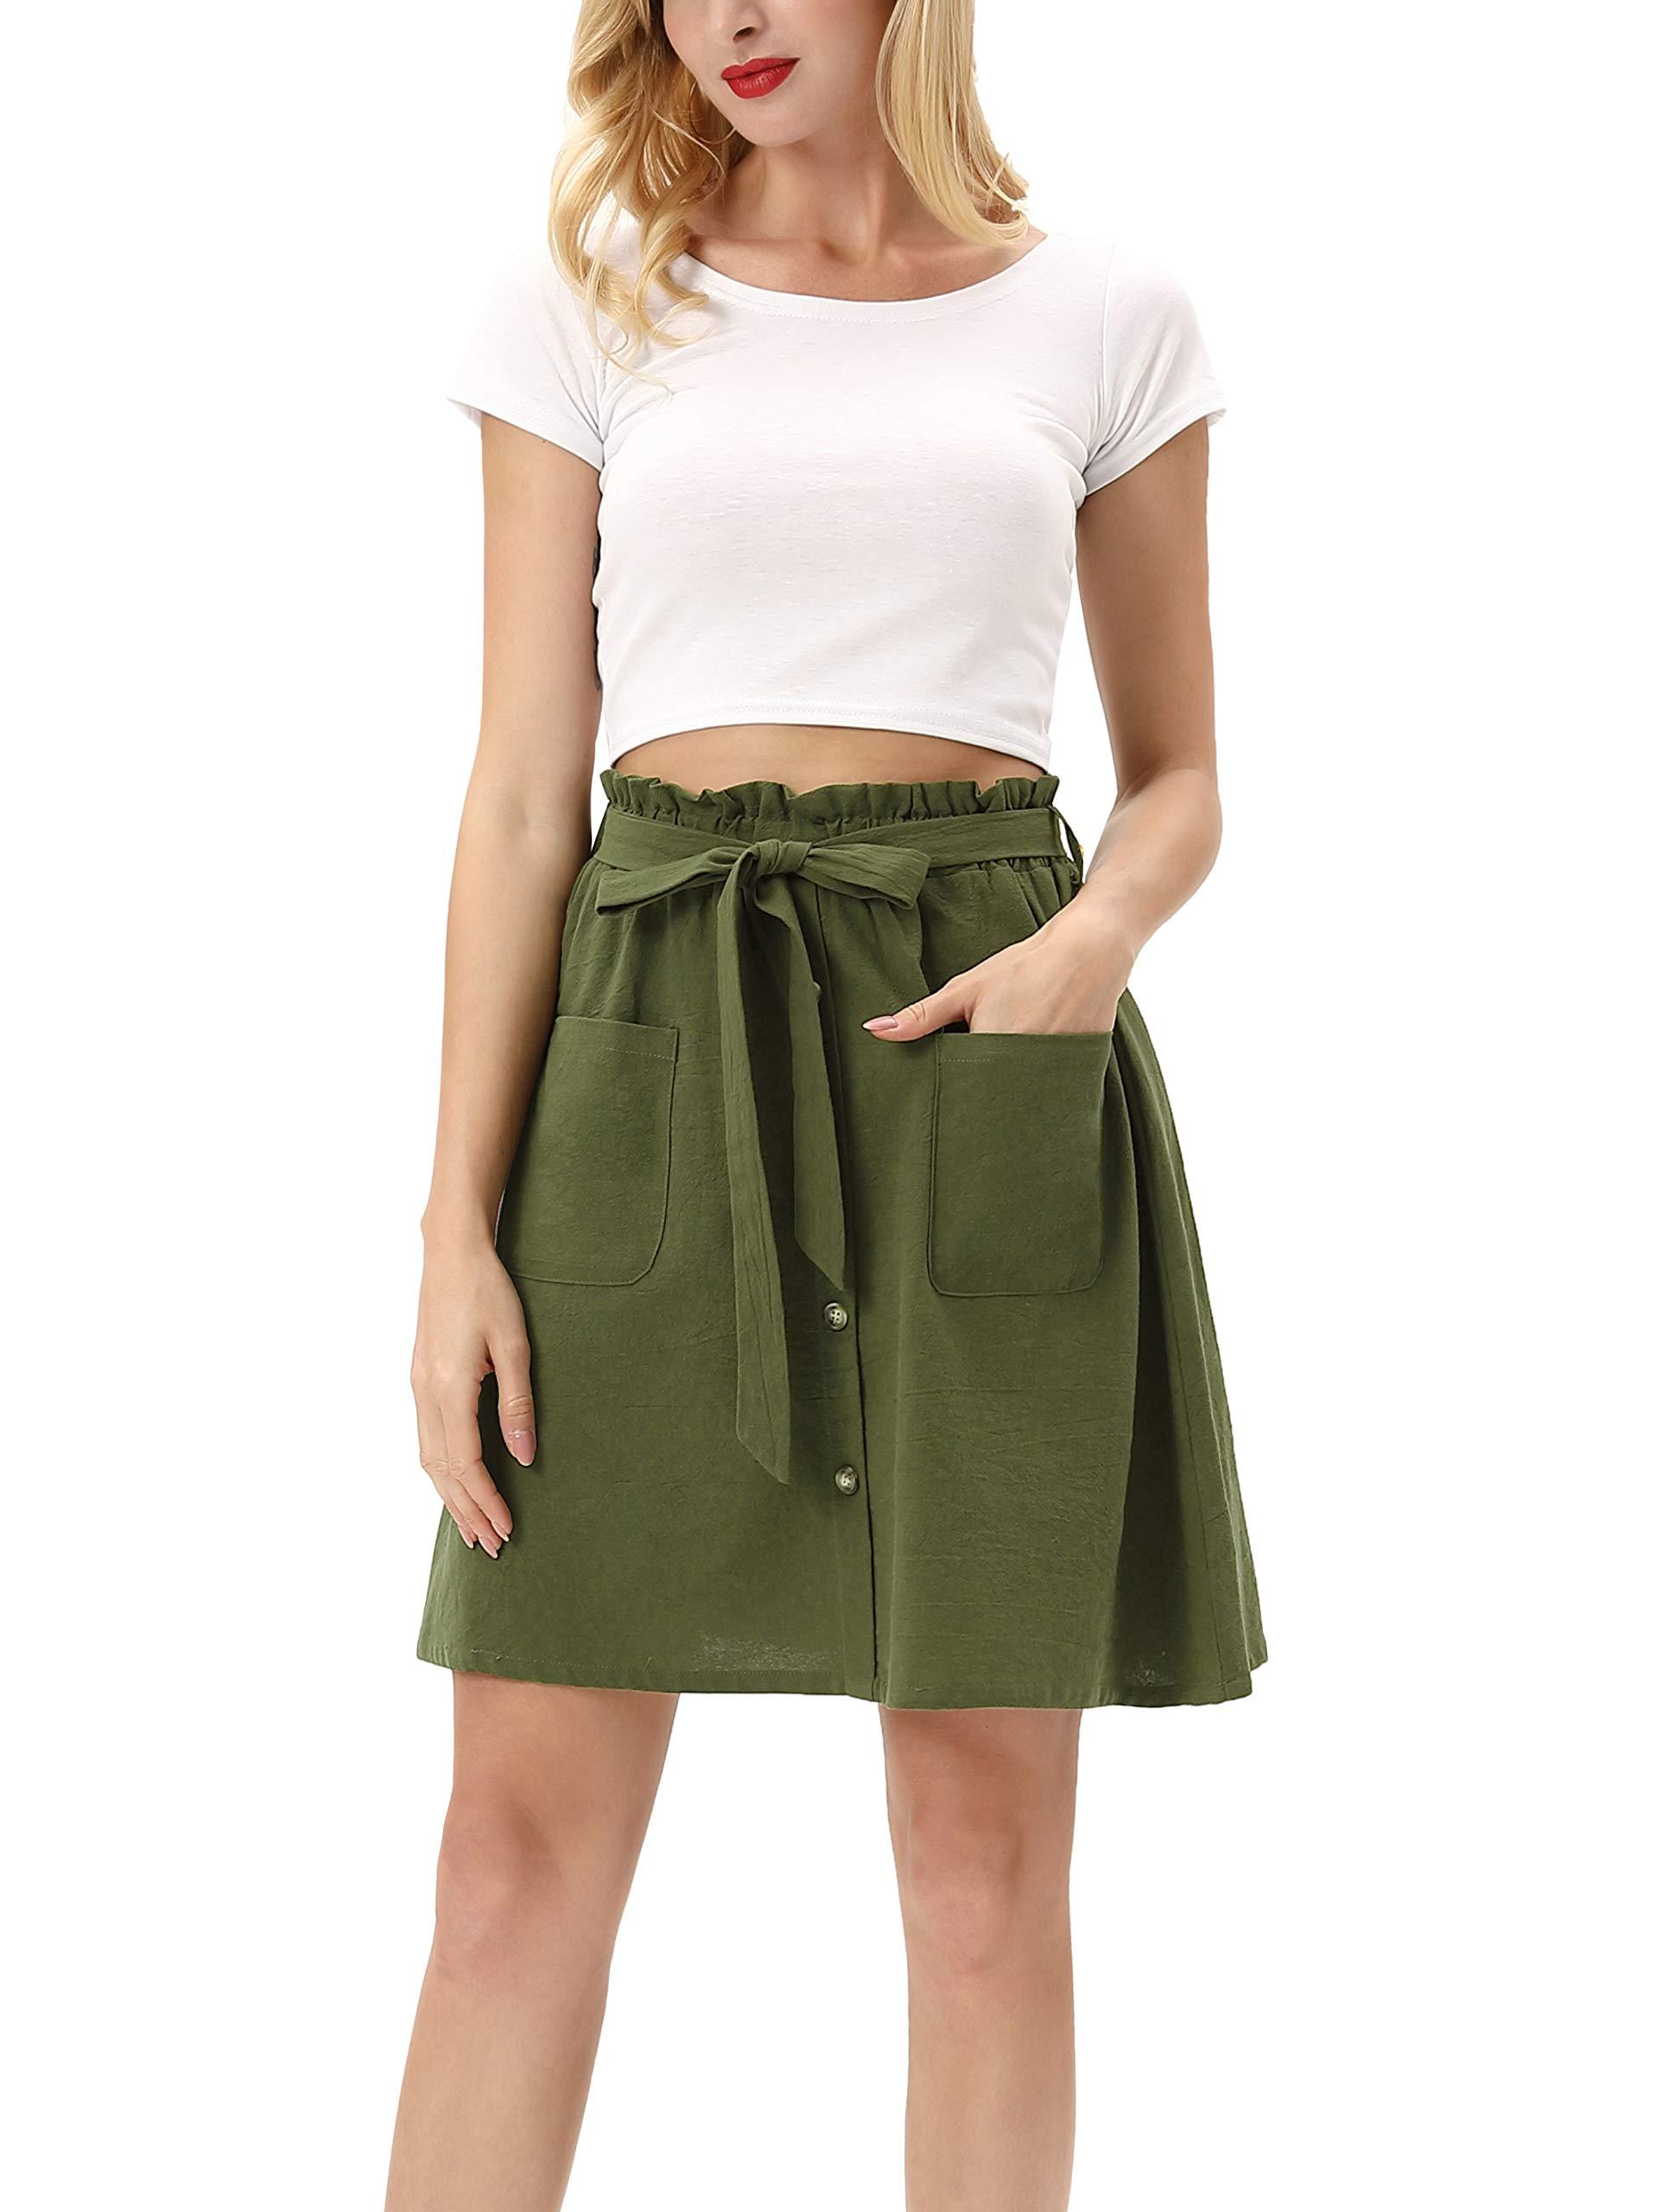 Kate Kasin Women Casual Self Tie High Waist Pleated A-Line Midi Skirt with Pocket